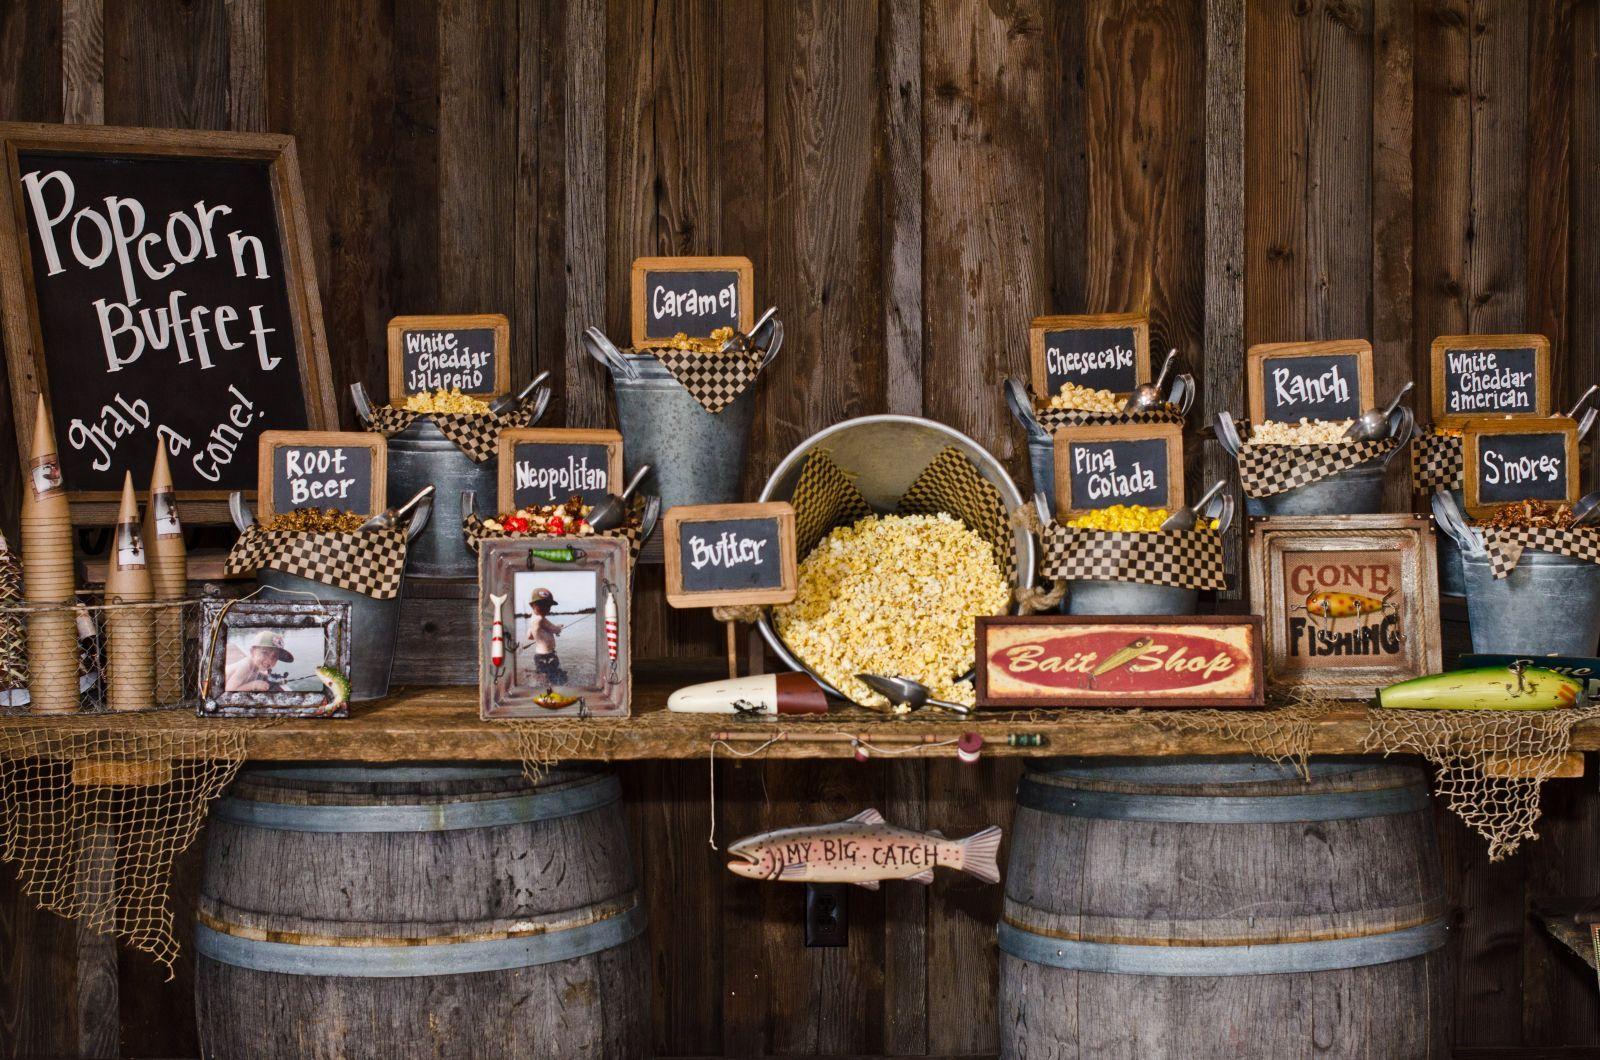 Popcorn Buffet Freedom Snacks Appetizers Gourmet